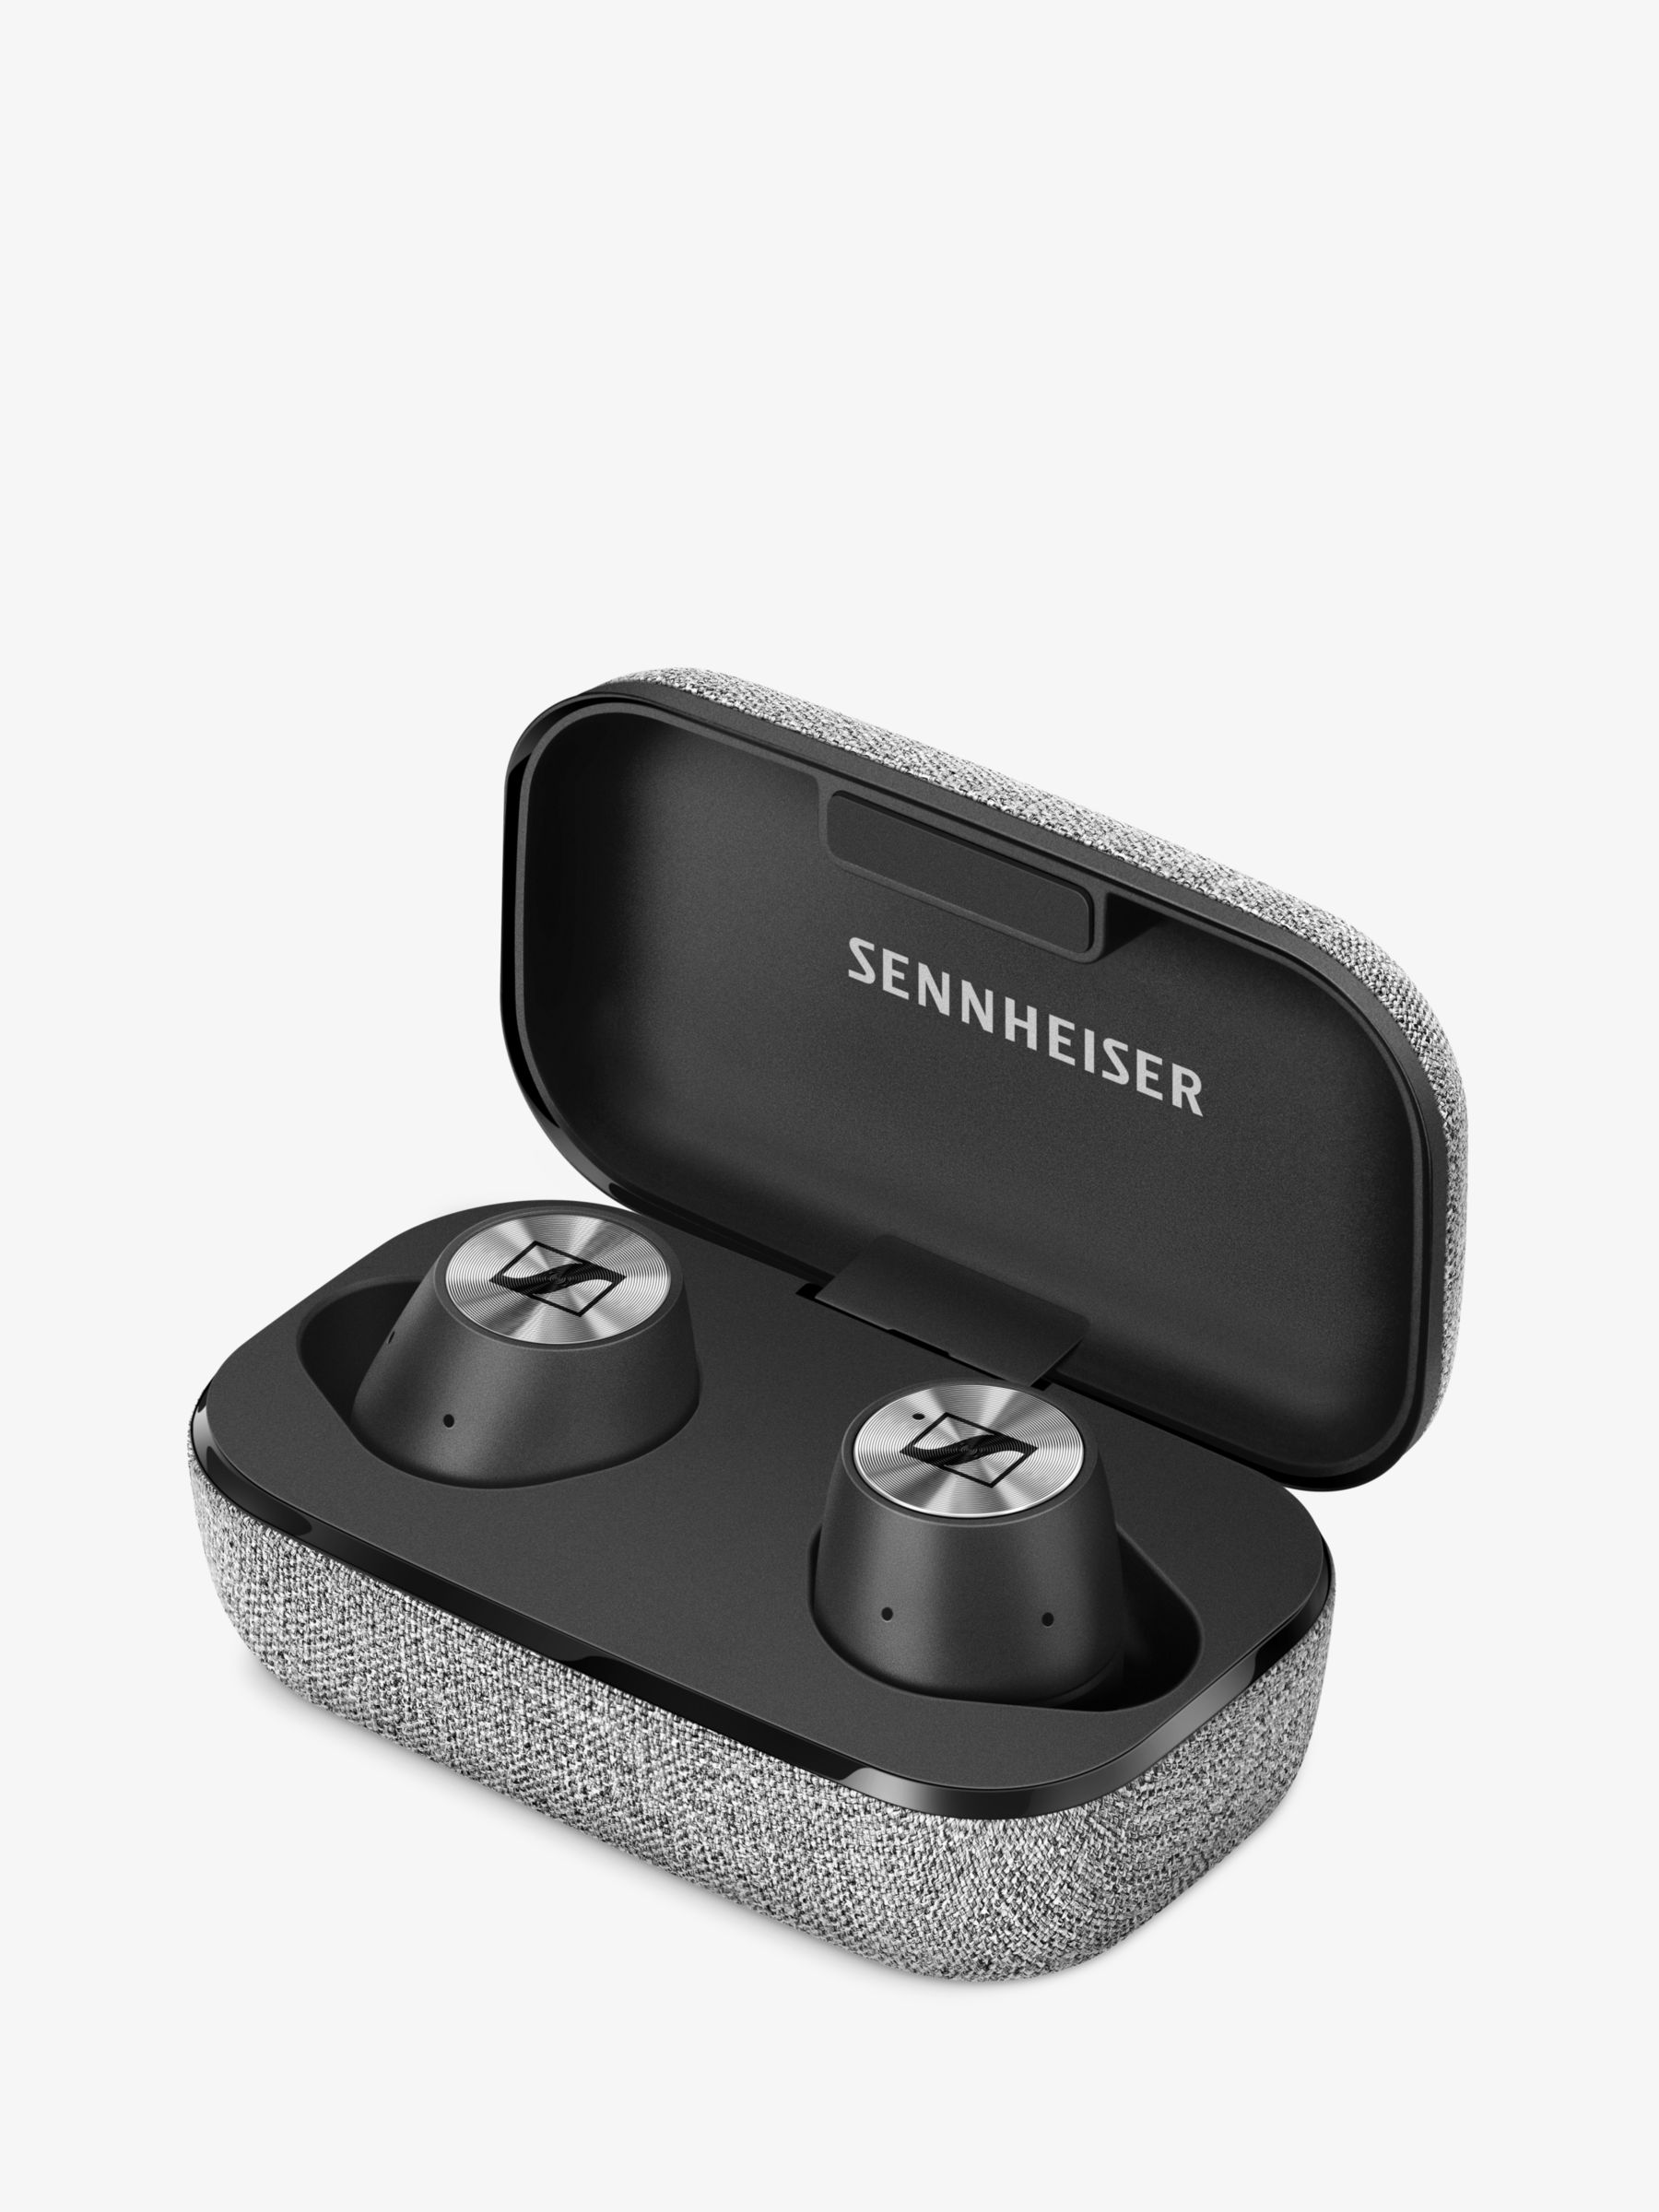 Sennheiser Sennheiser Momentum True Wireless Bluetooth In-Ear Headphones with Mic/Remote